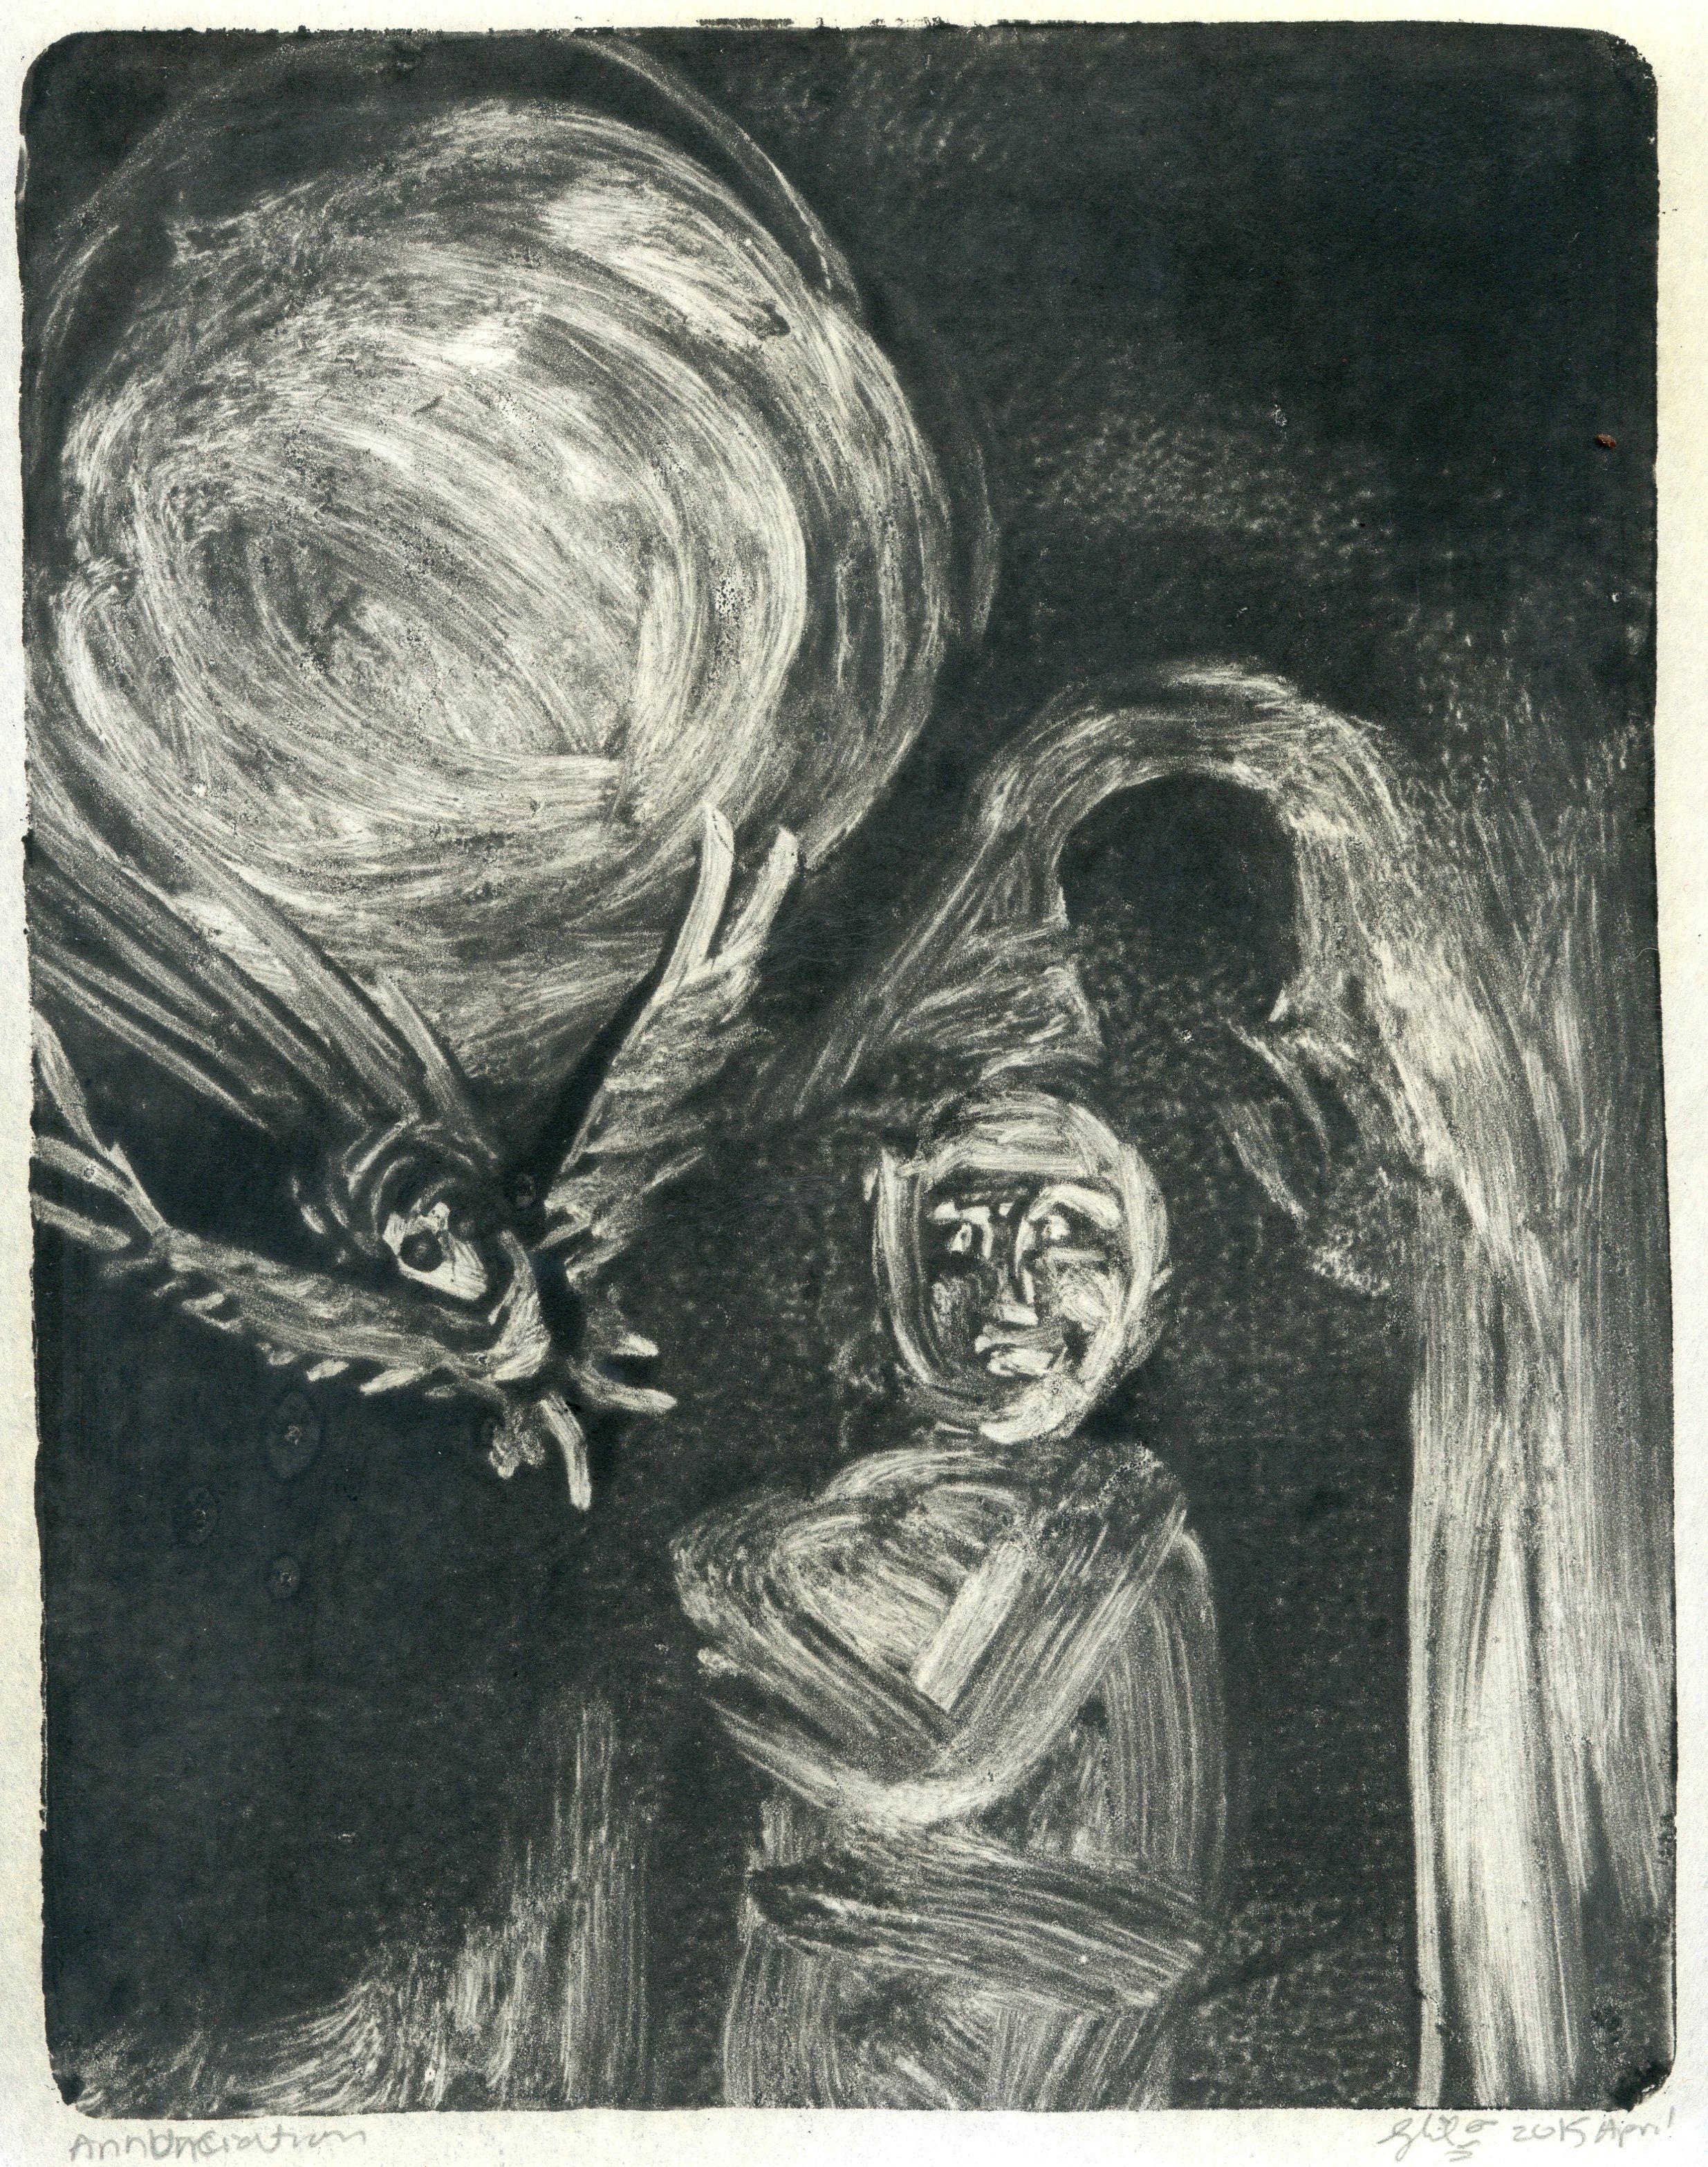 the artist's annunciation